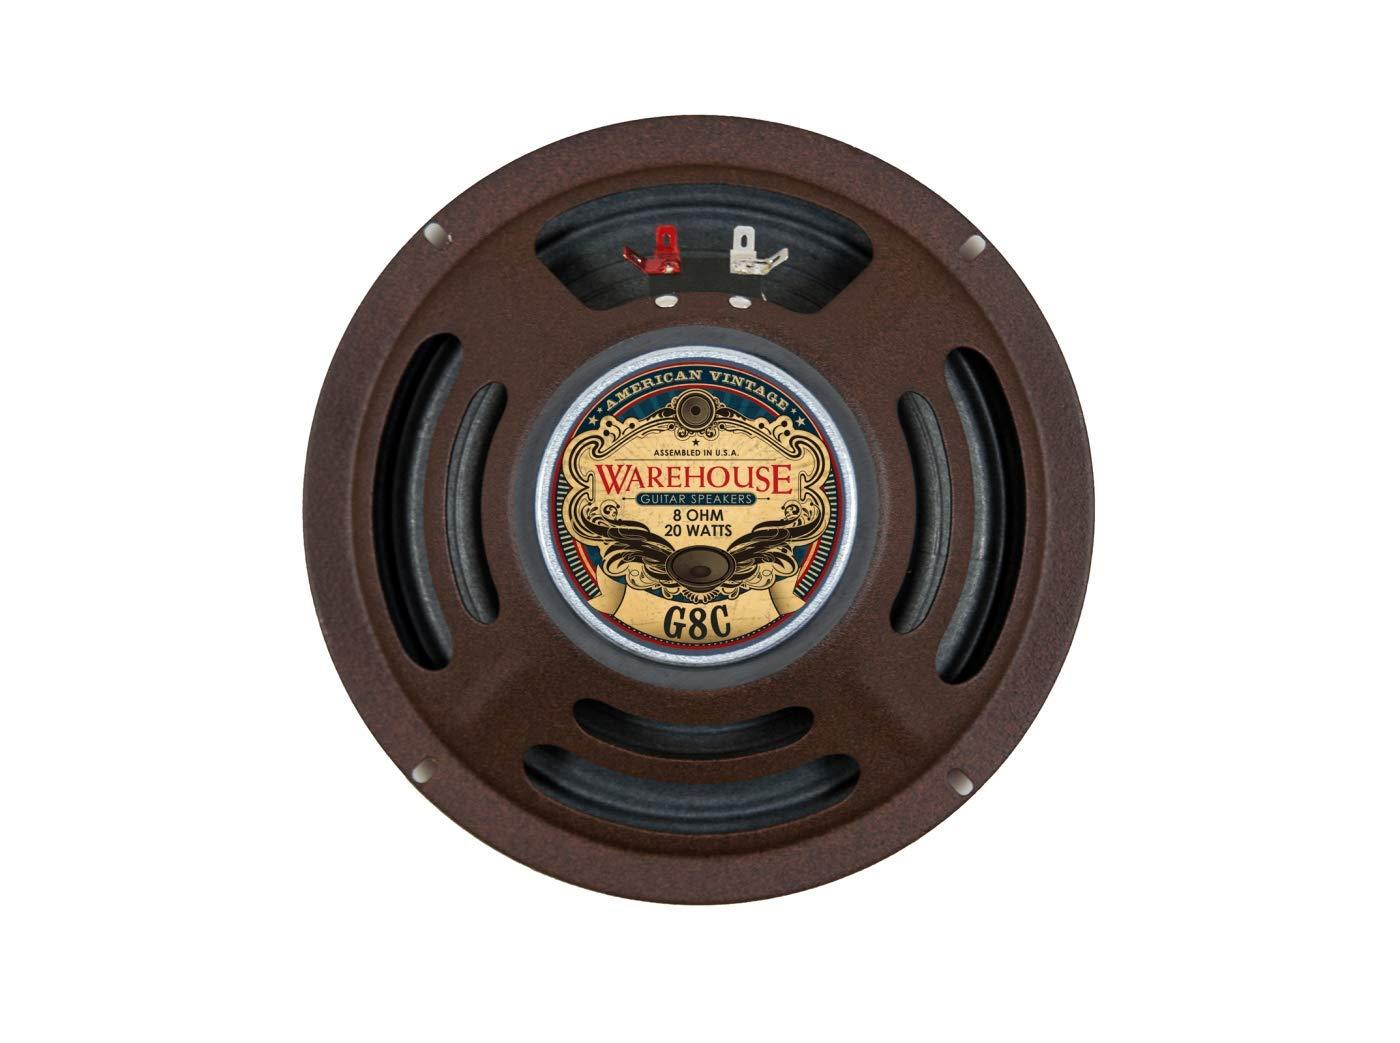 Warehouse Guitar Speakers G8C 8'' 20W American Vintage Guitar Speaker 4 ohms by Warehouse Guitar Speakers